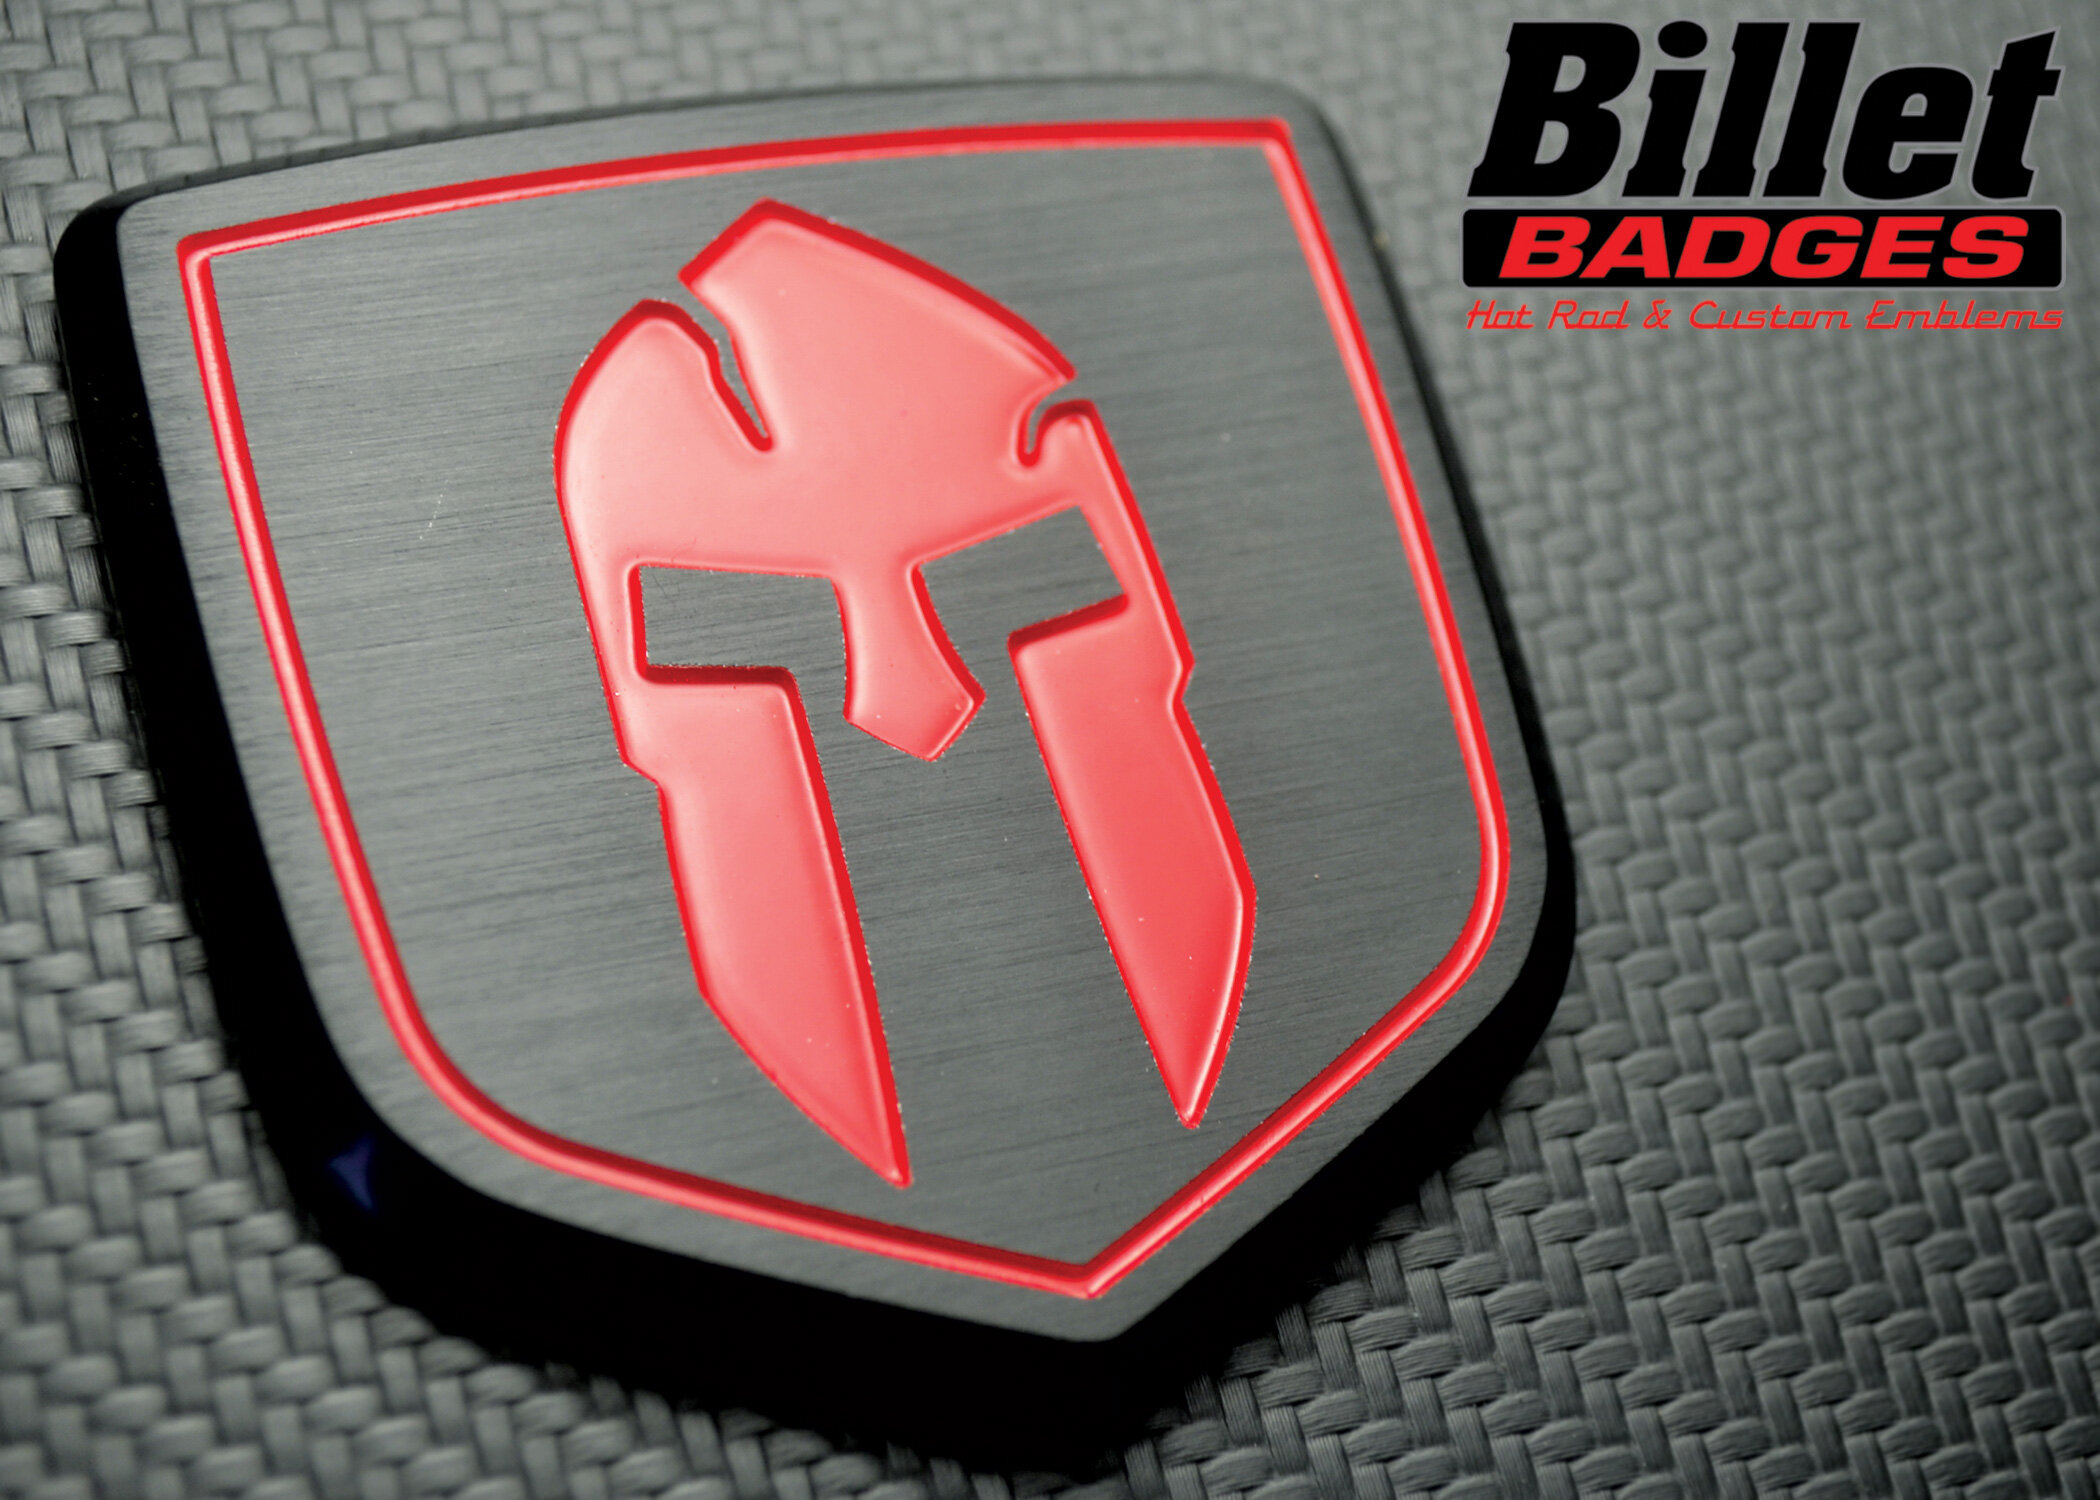 spartan_helmet_cracked_shield.jpg